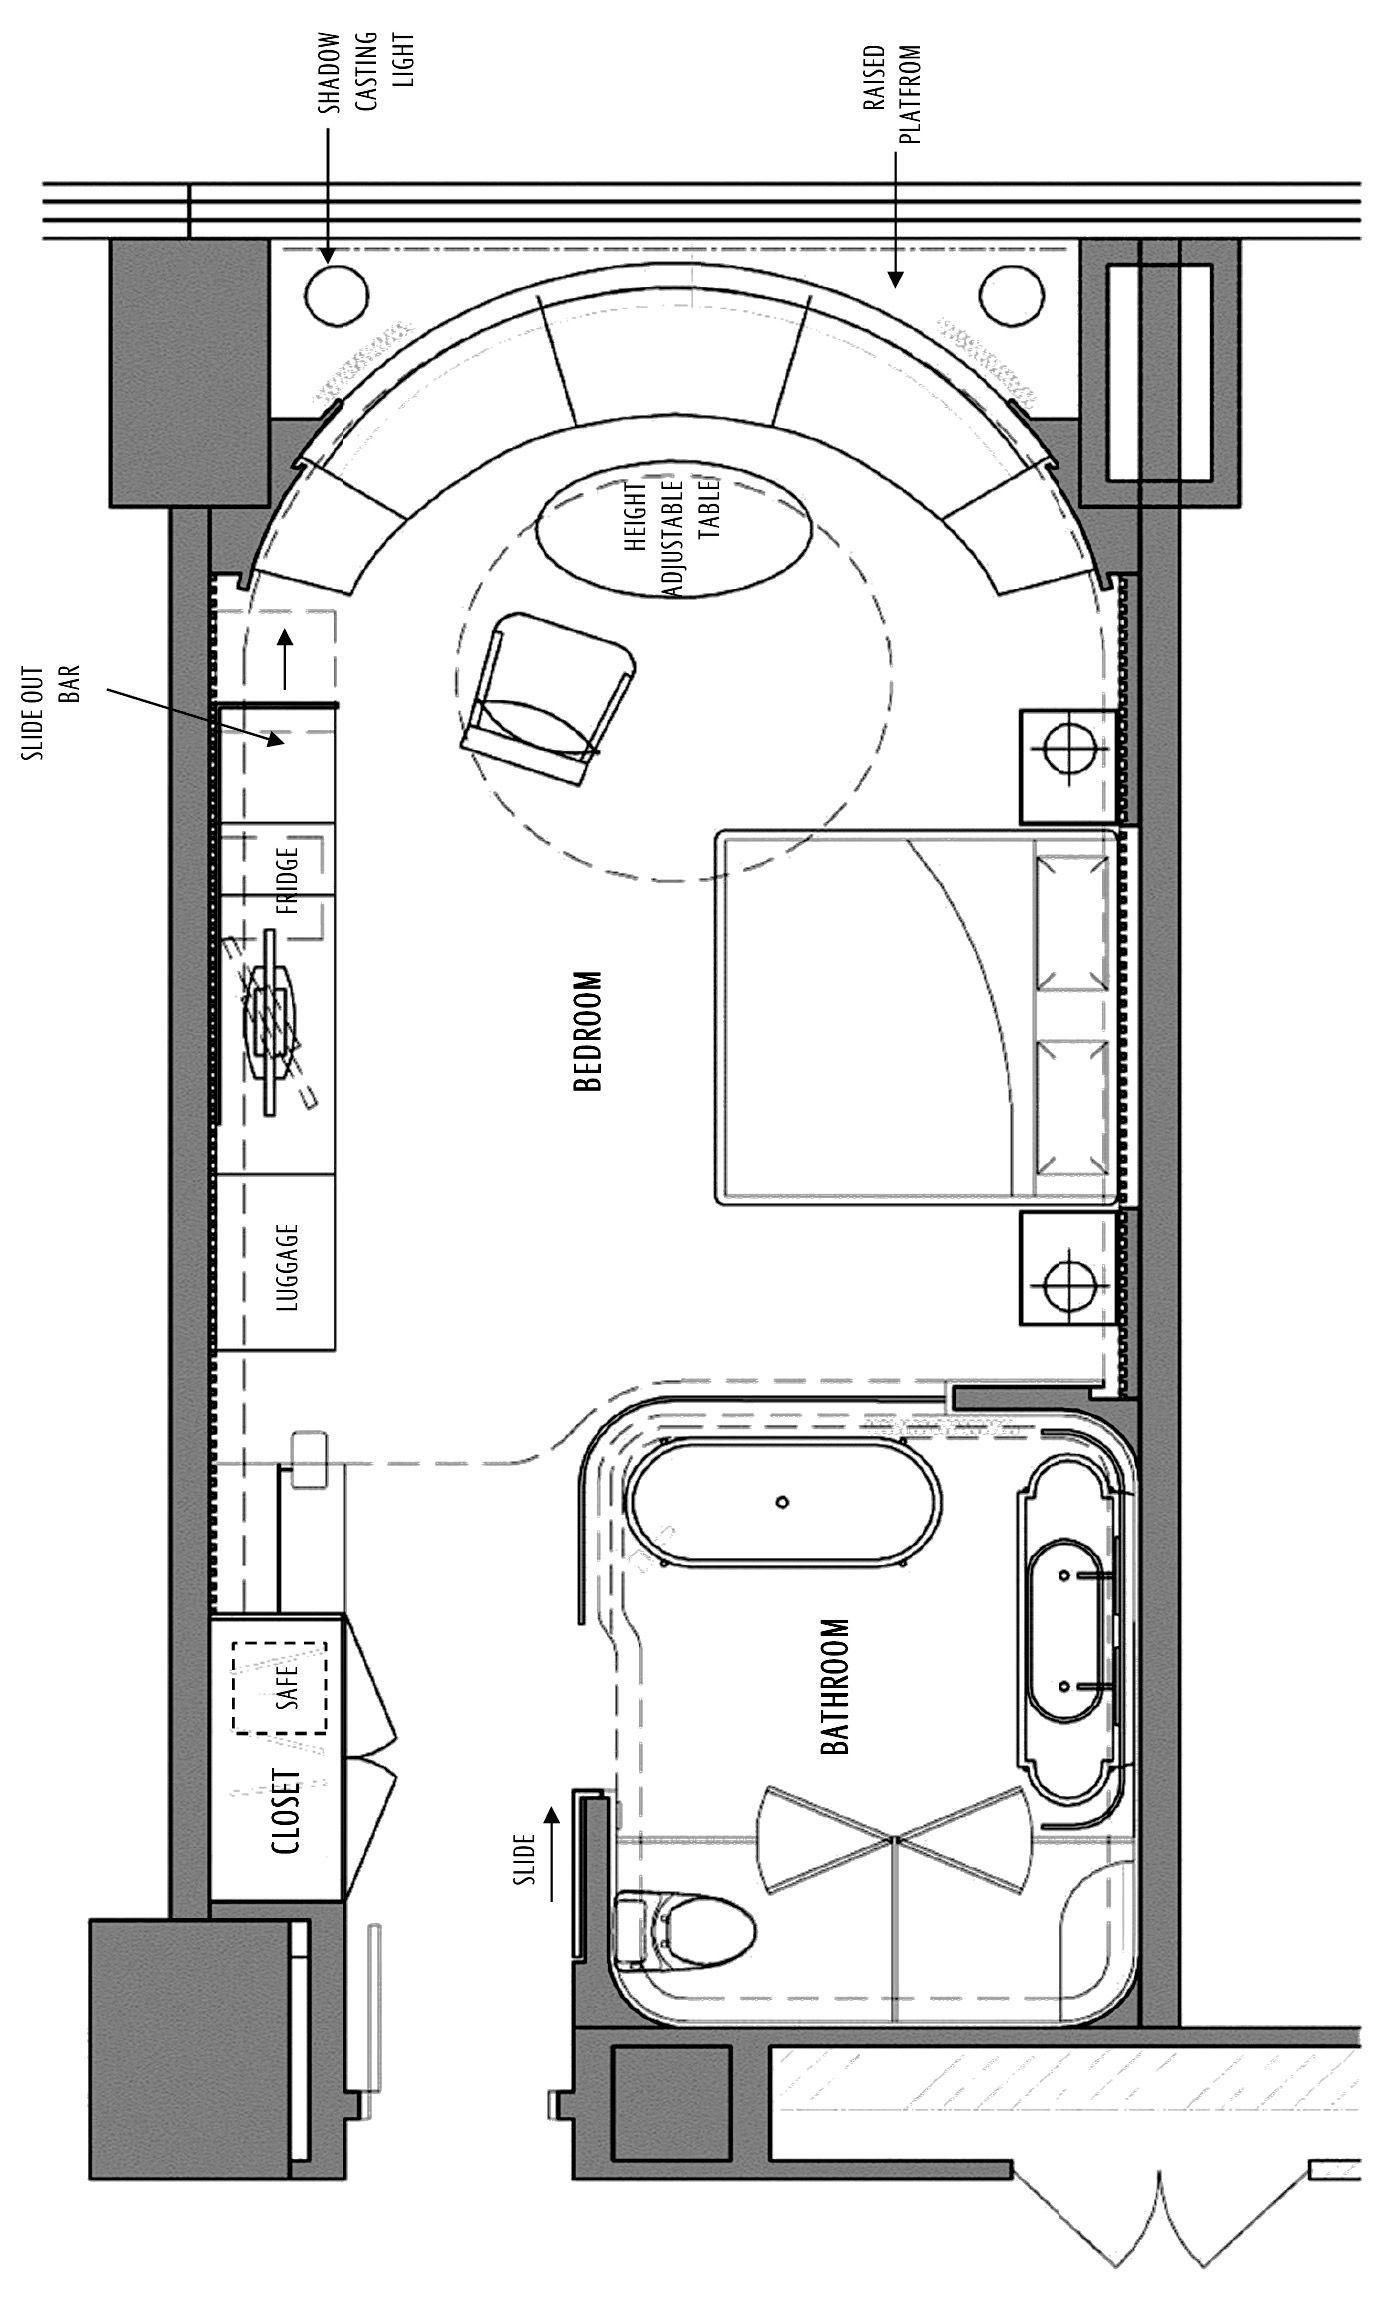 Hotel Room Plan: Hotel Room Design Plan, Hotel Plan